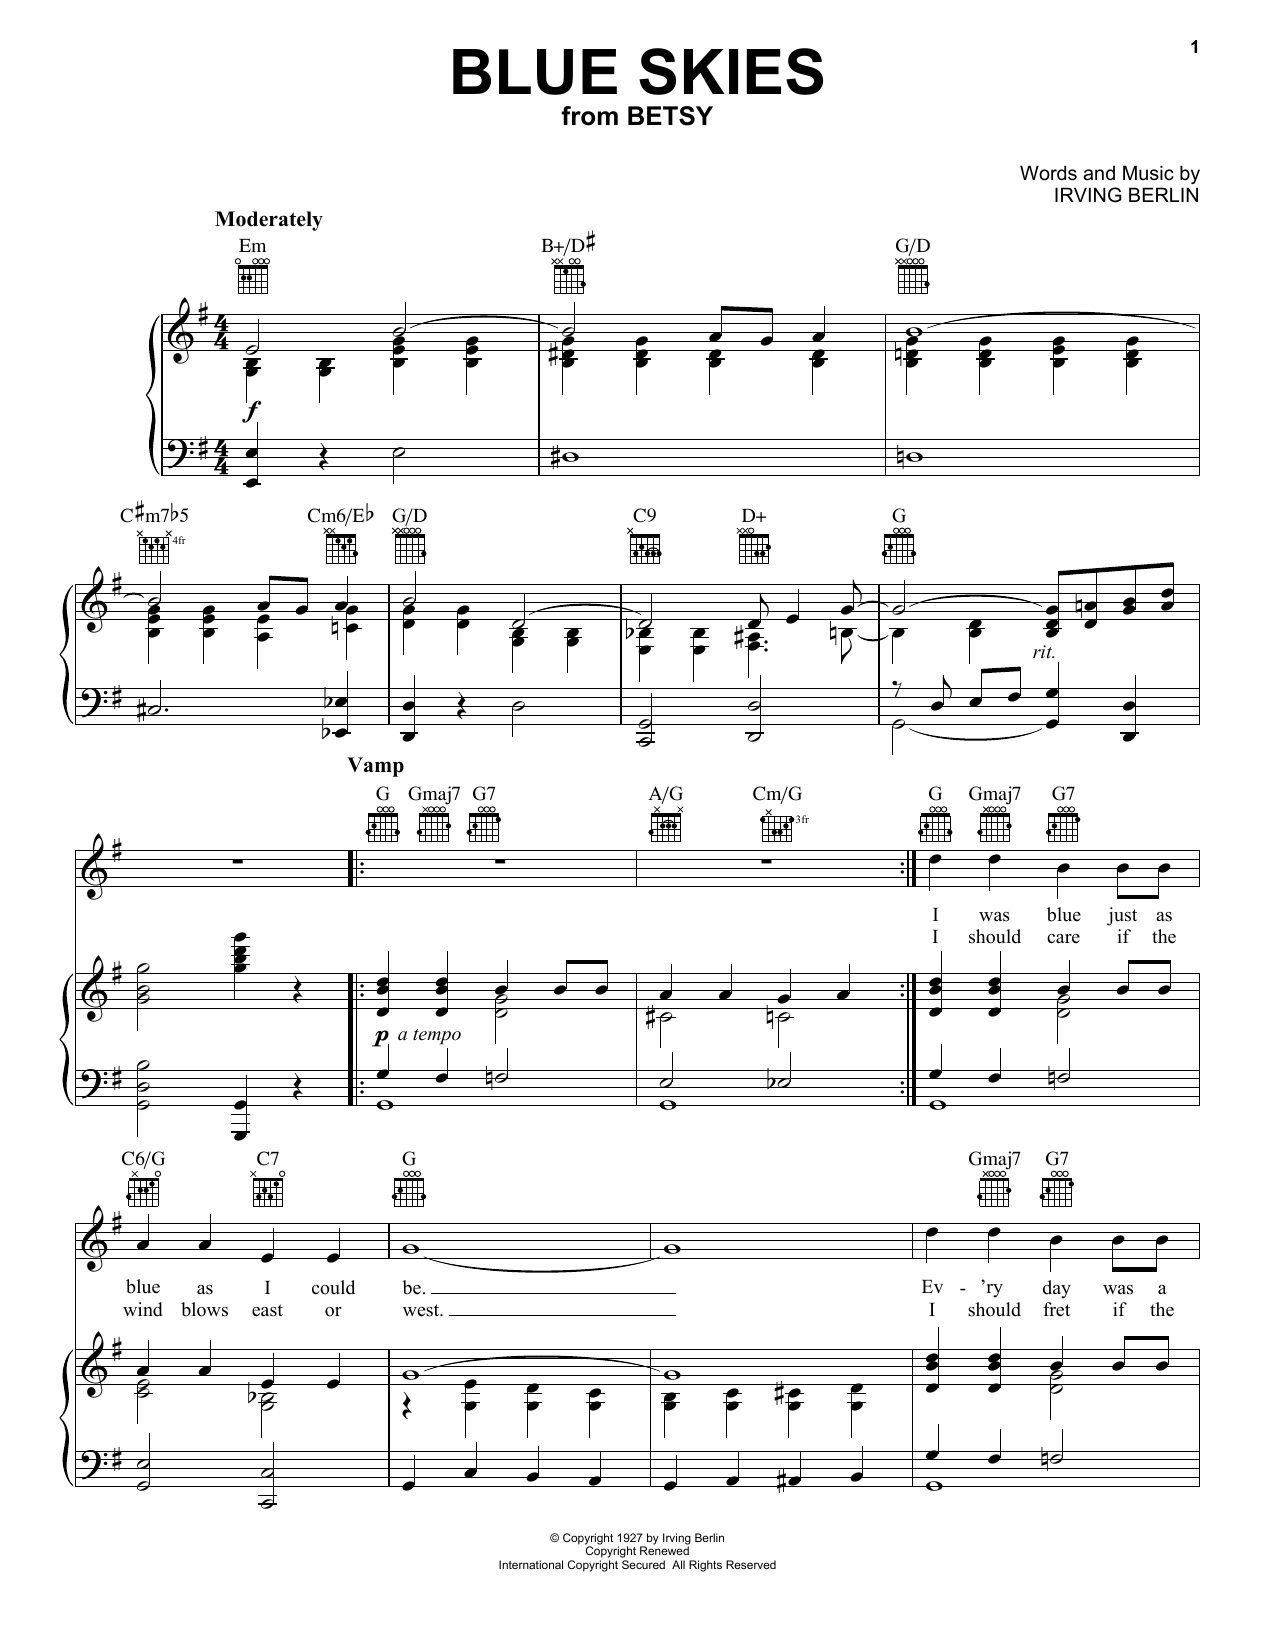 Frank Sinatra Blue Skies sheet music notes and chords. Download Printable PDF.